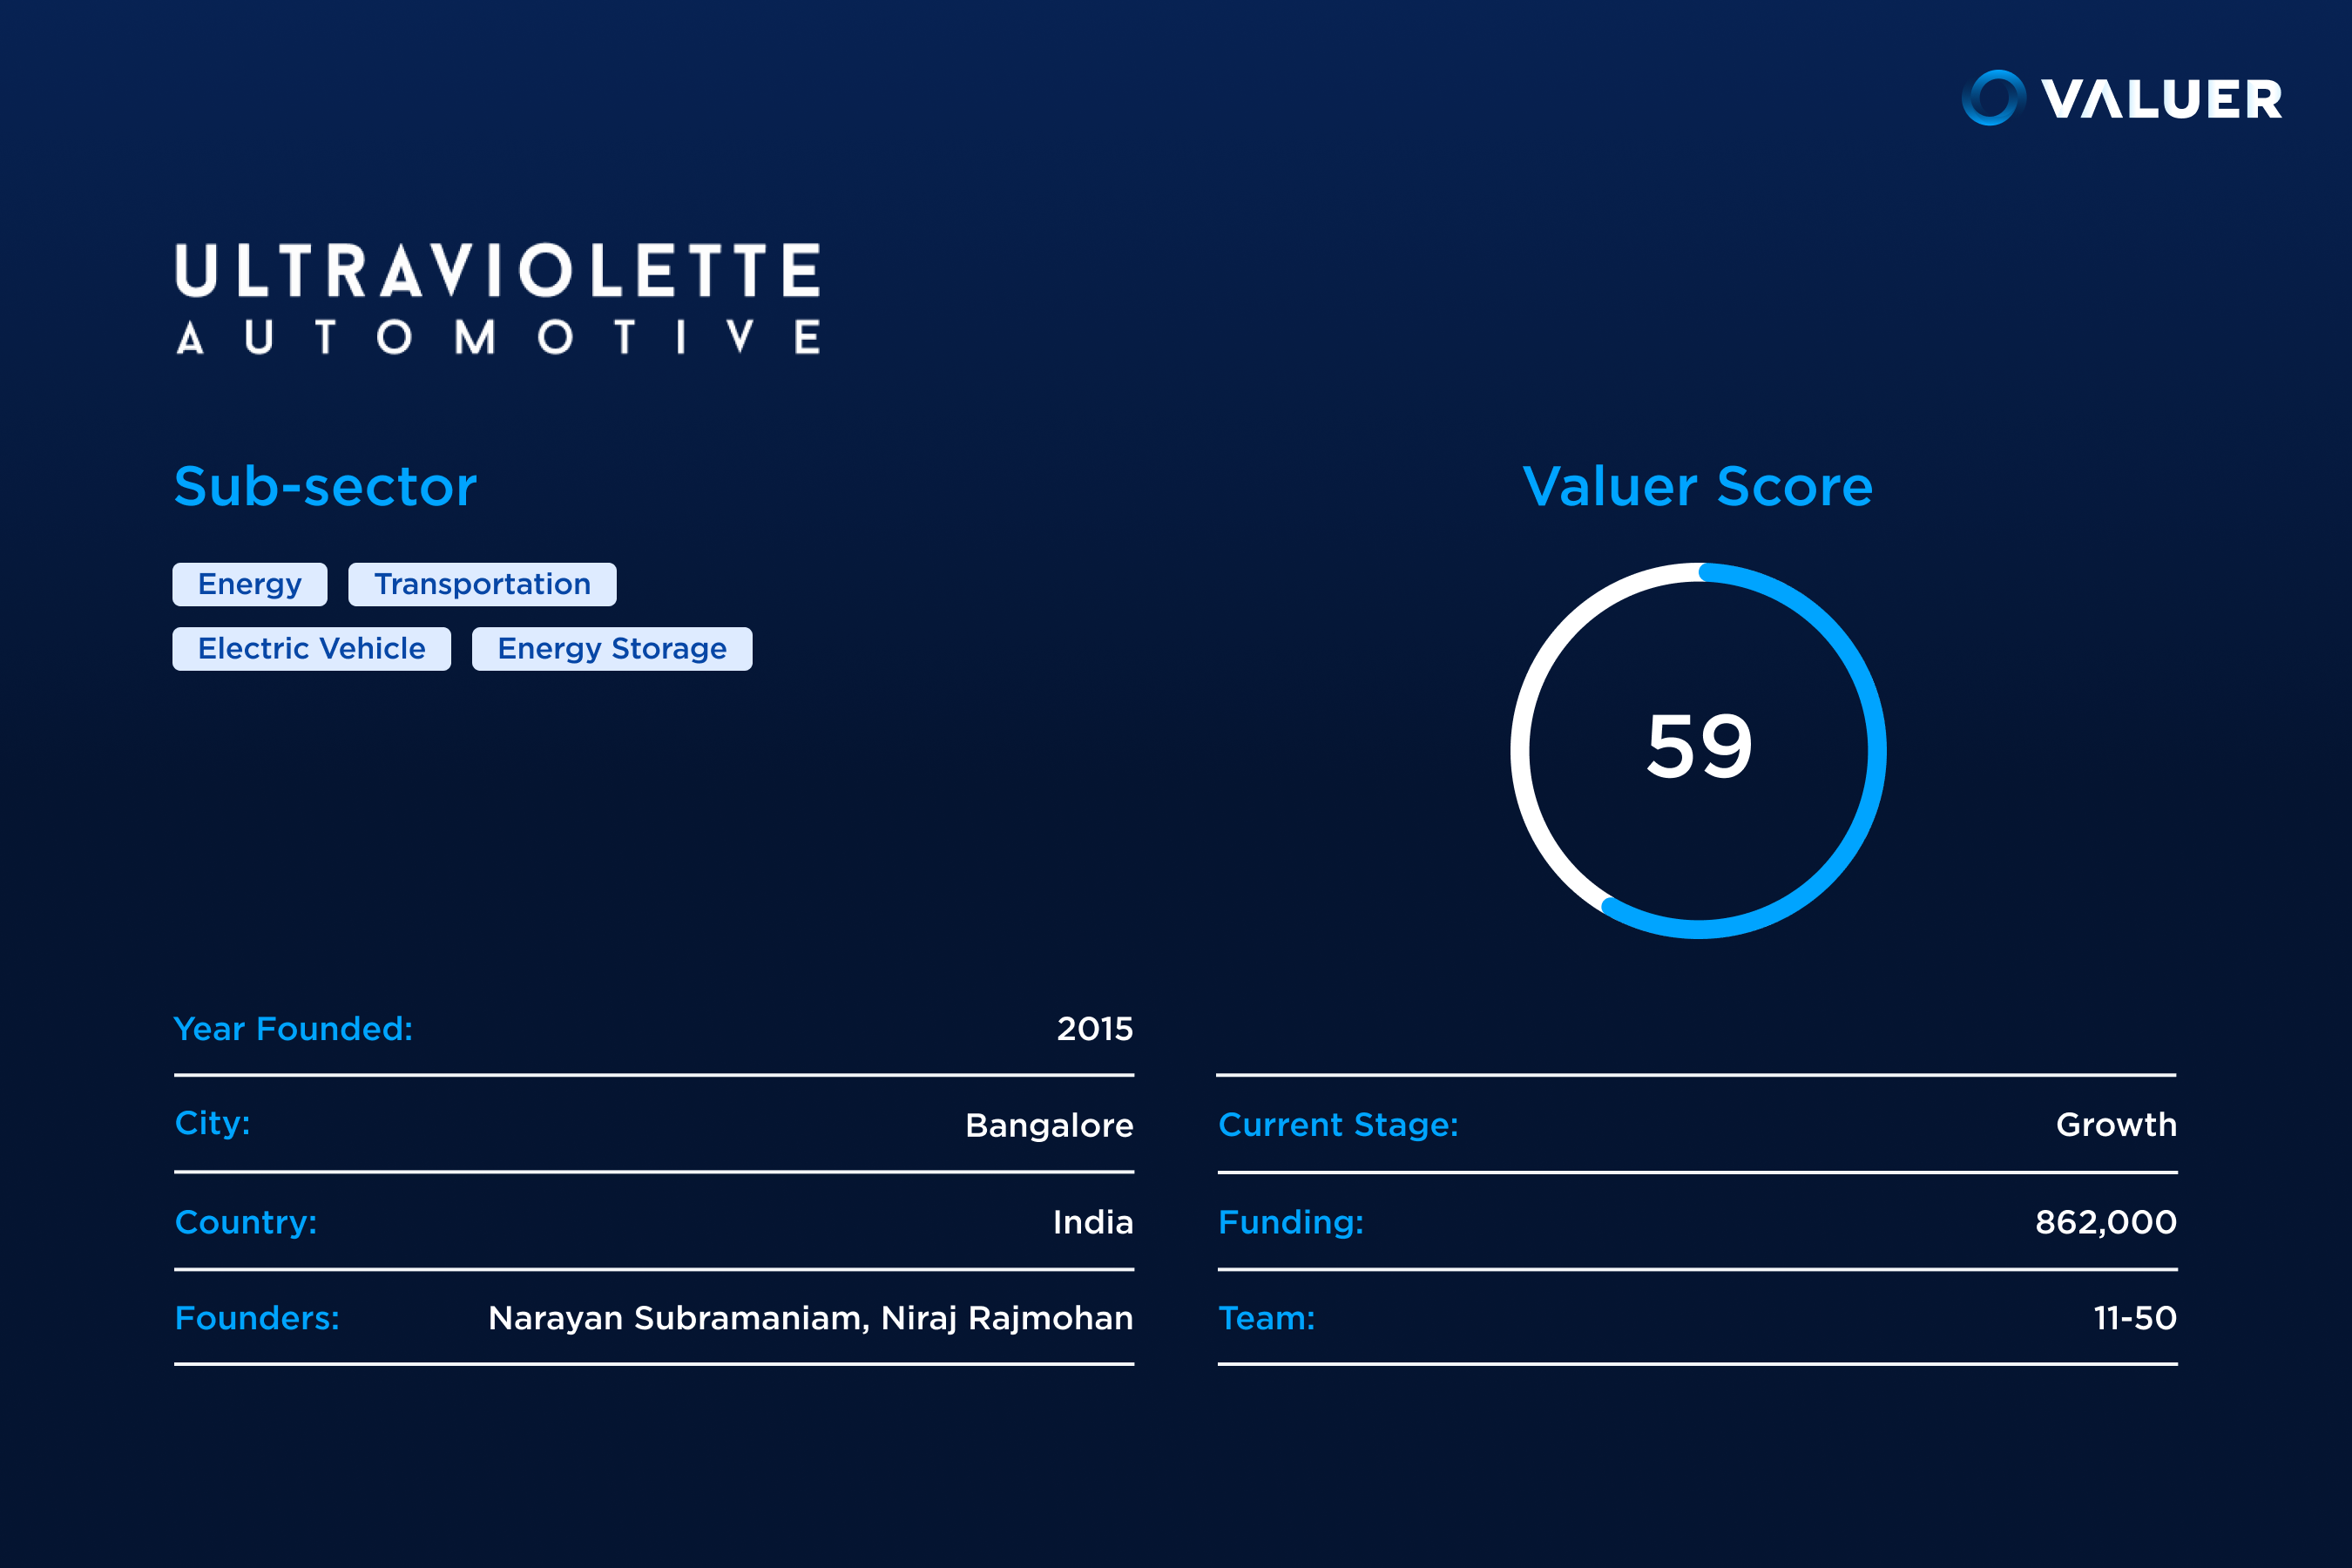 Ultraviolette Automotive Valuer score